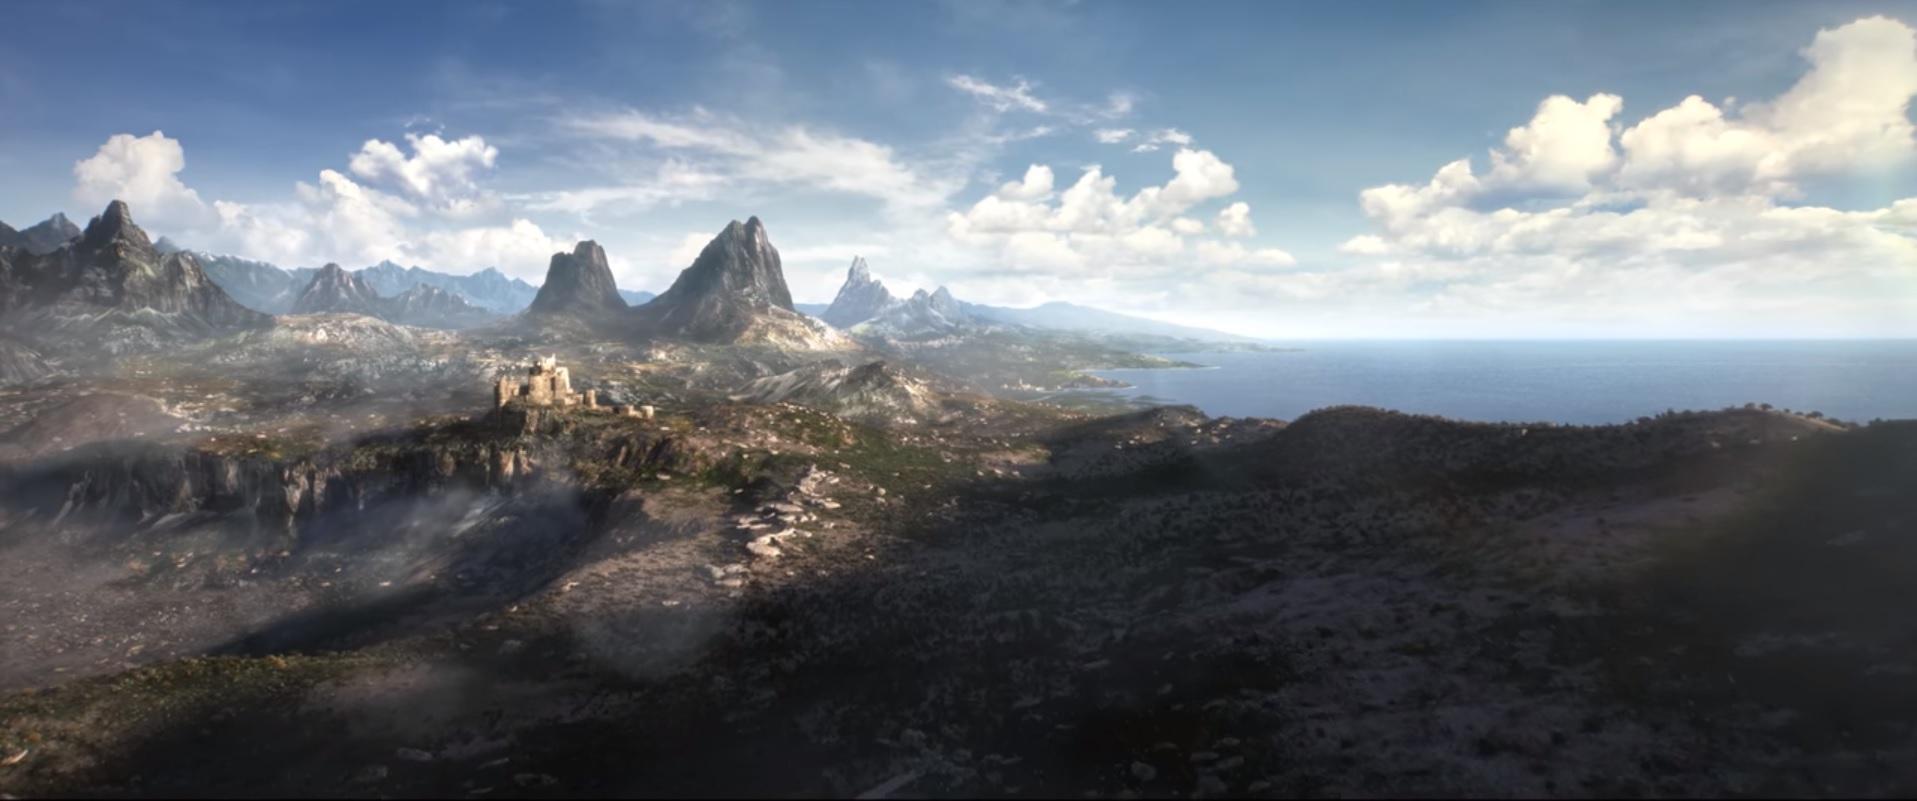 Games Inbox: The Elder Scrolls 6 release date estimate, Resident Evil 8 positivity, and F-Zero open world ideas